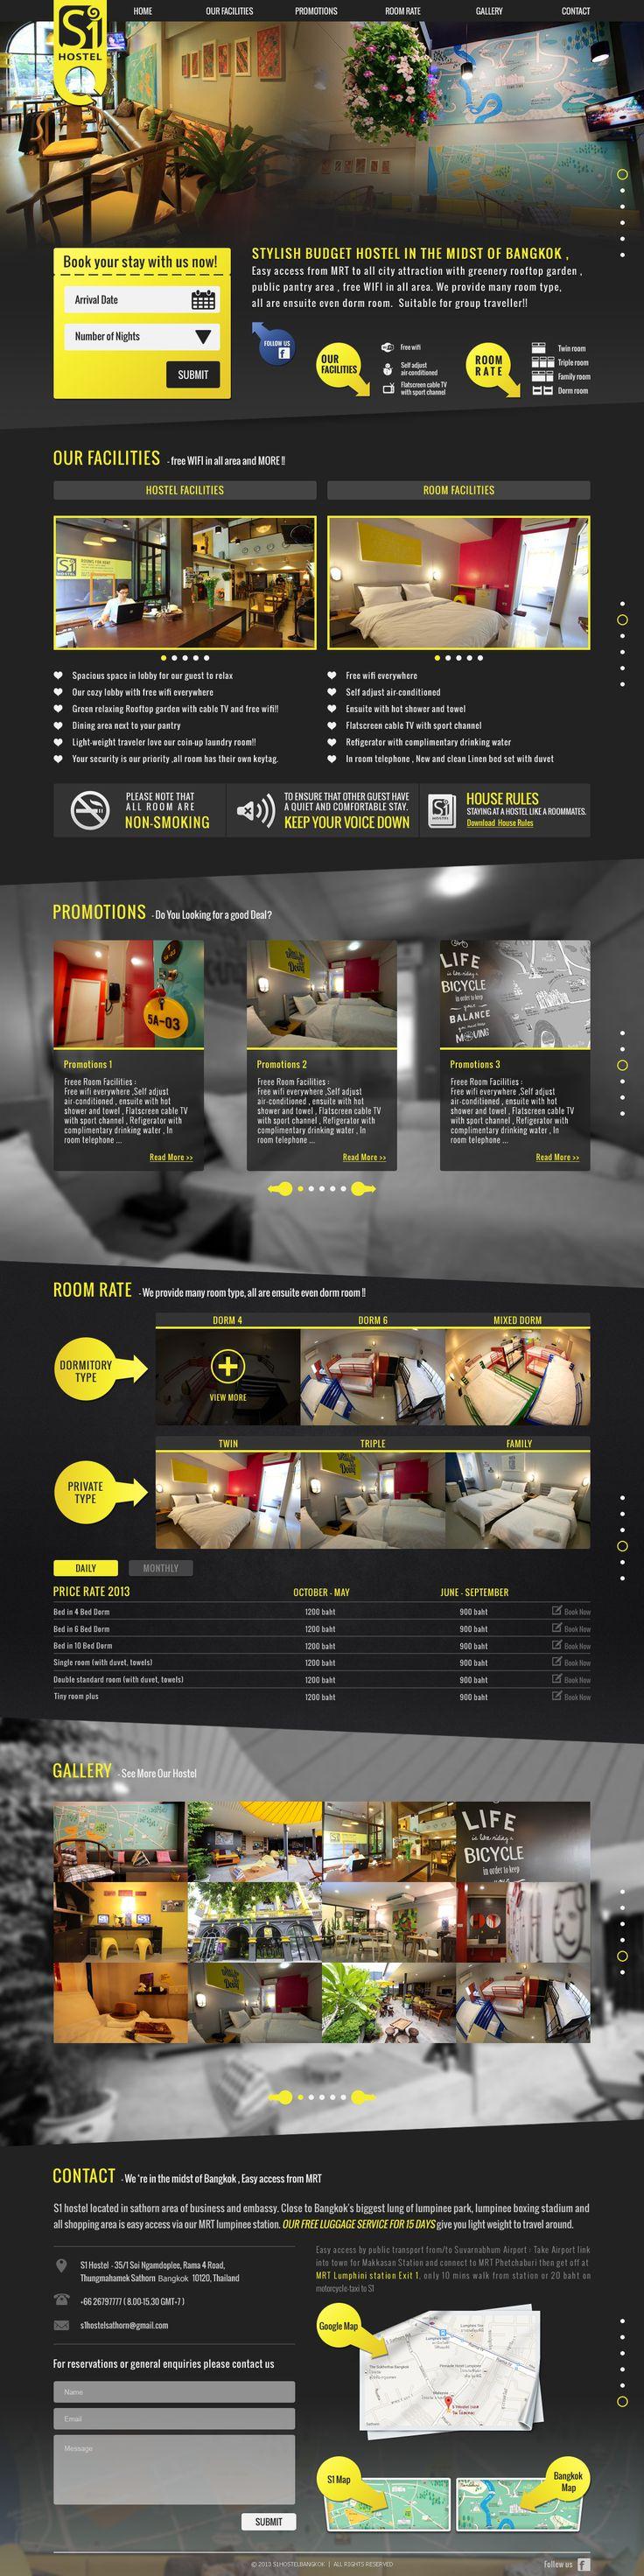 hostel website